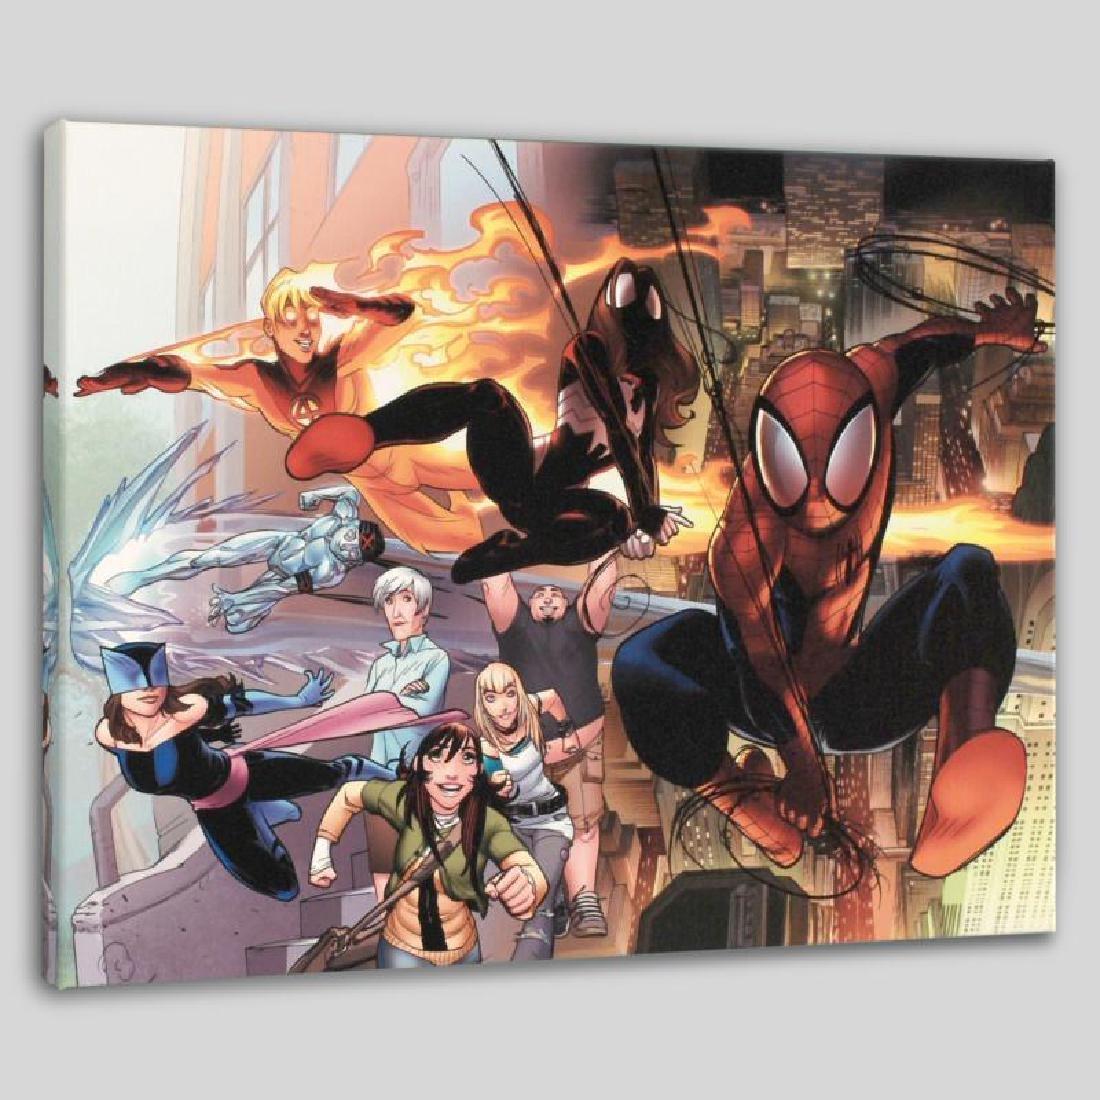 Ultimate Comics: Spider-Man #1 by Marvel Comics - 3